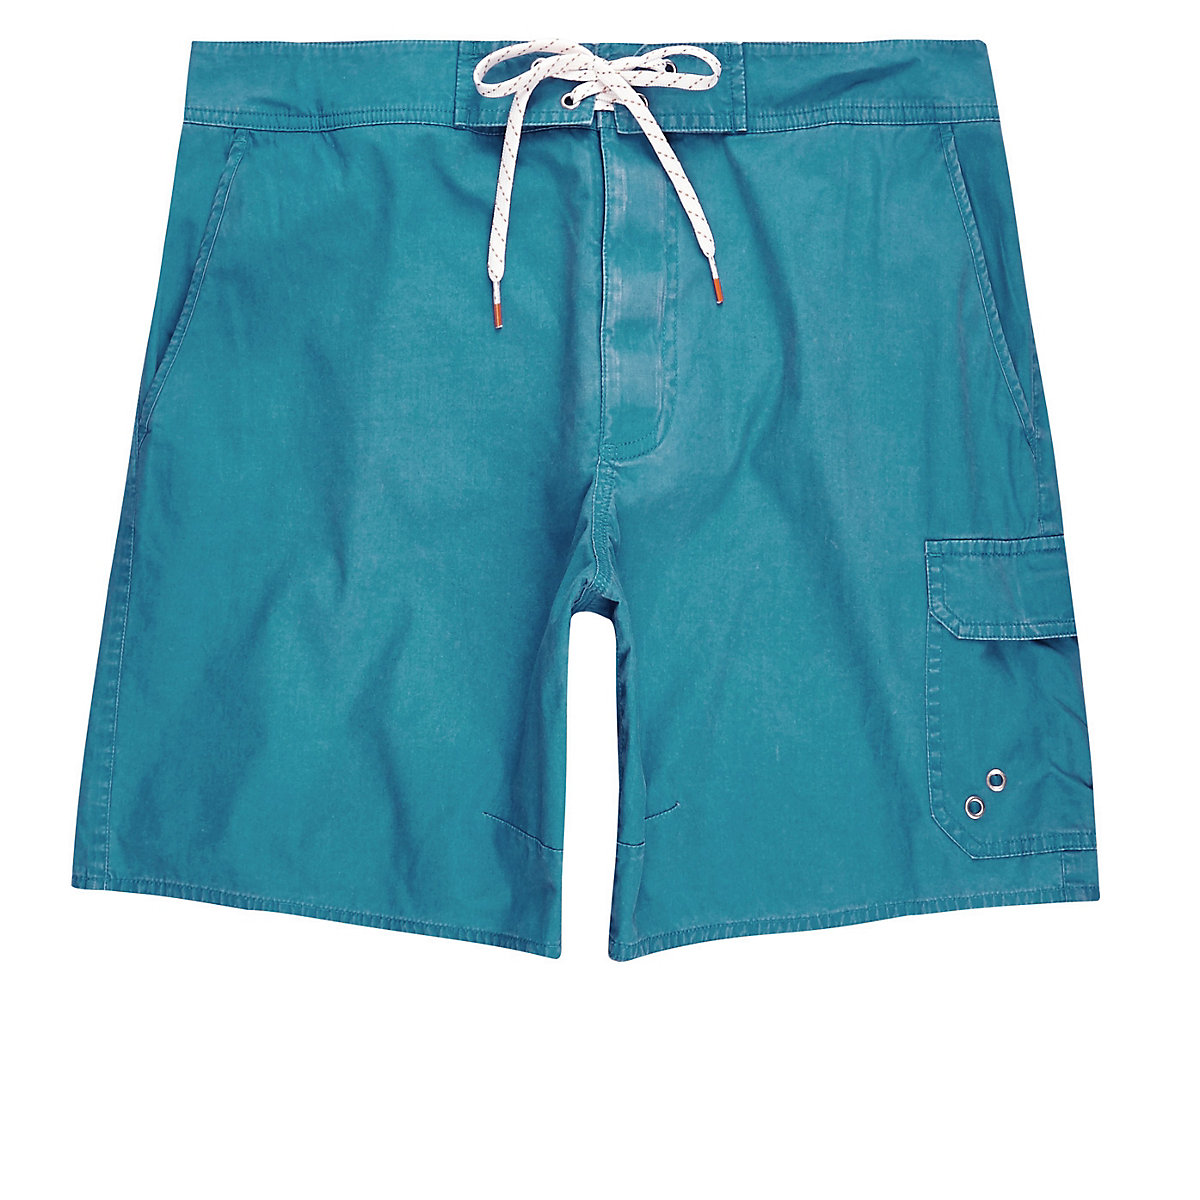 Blue acid wash swim trunks